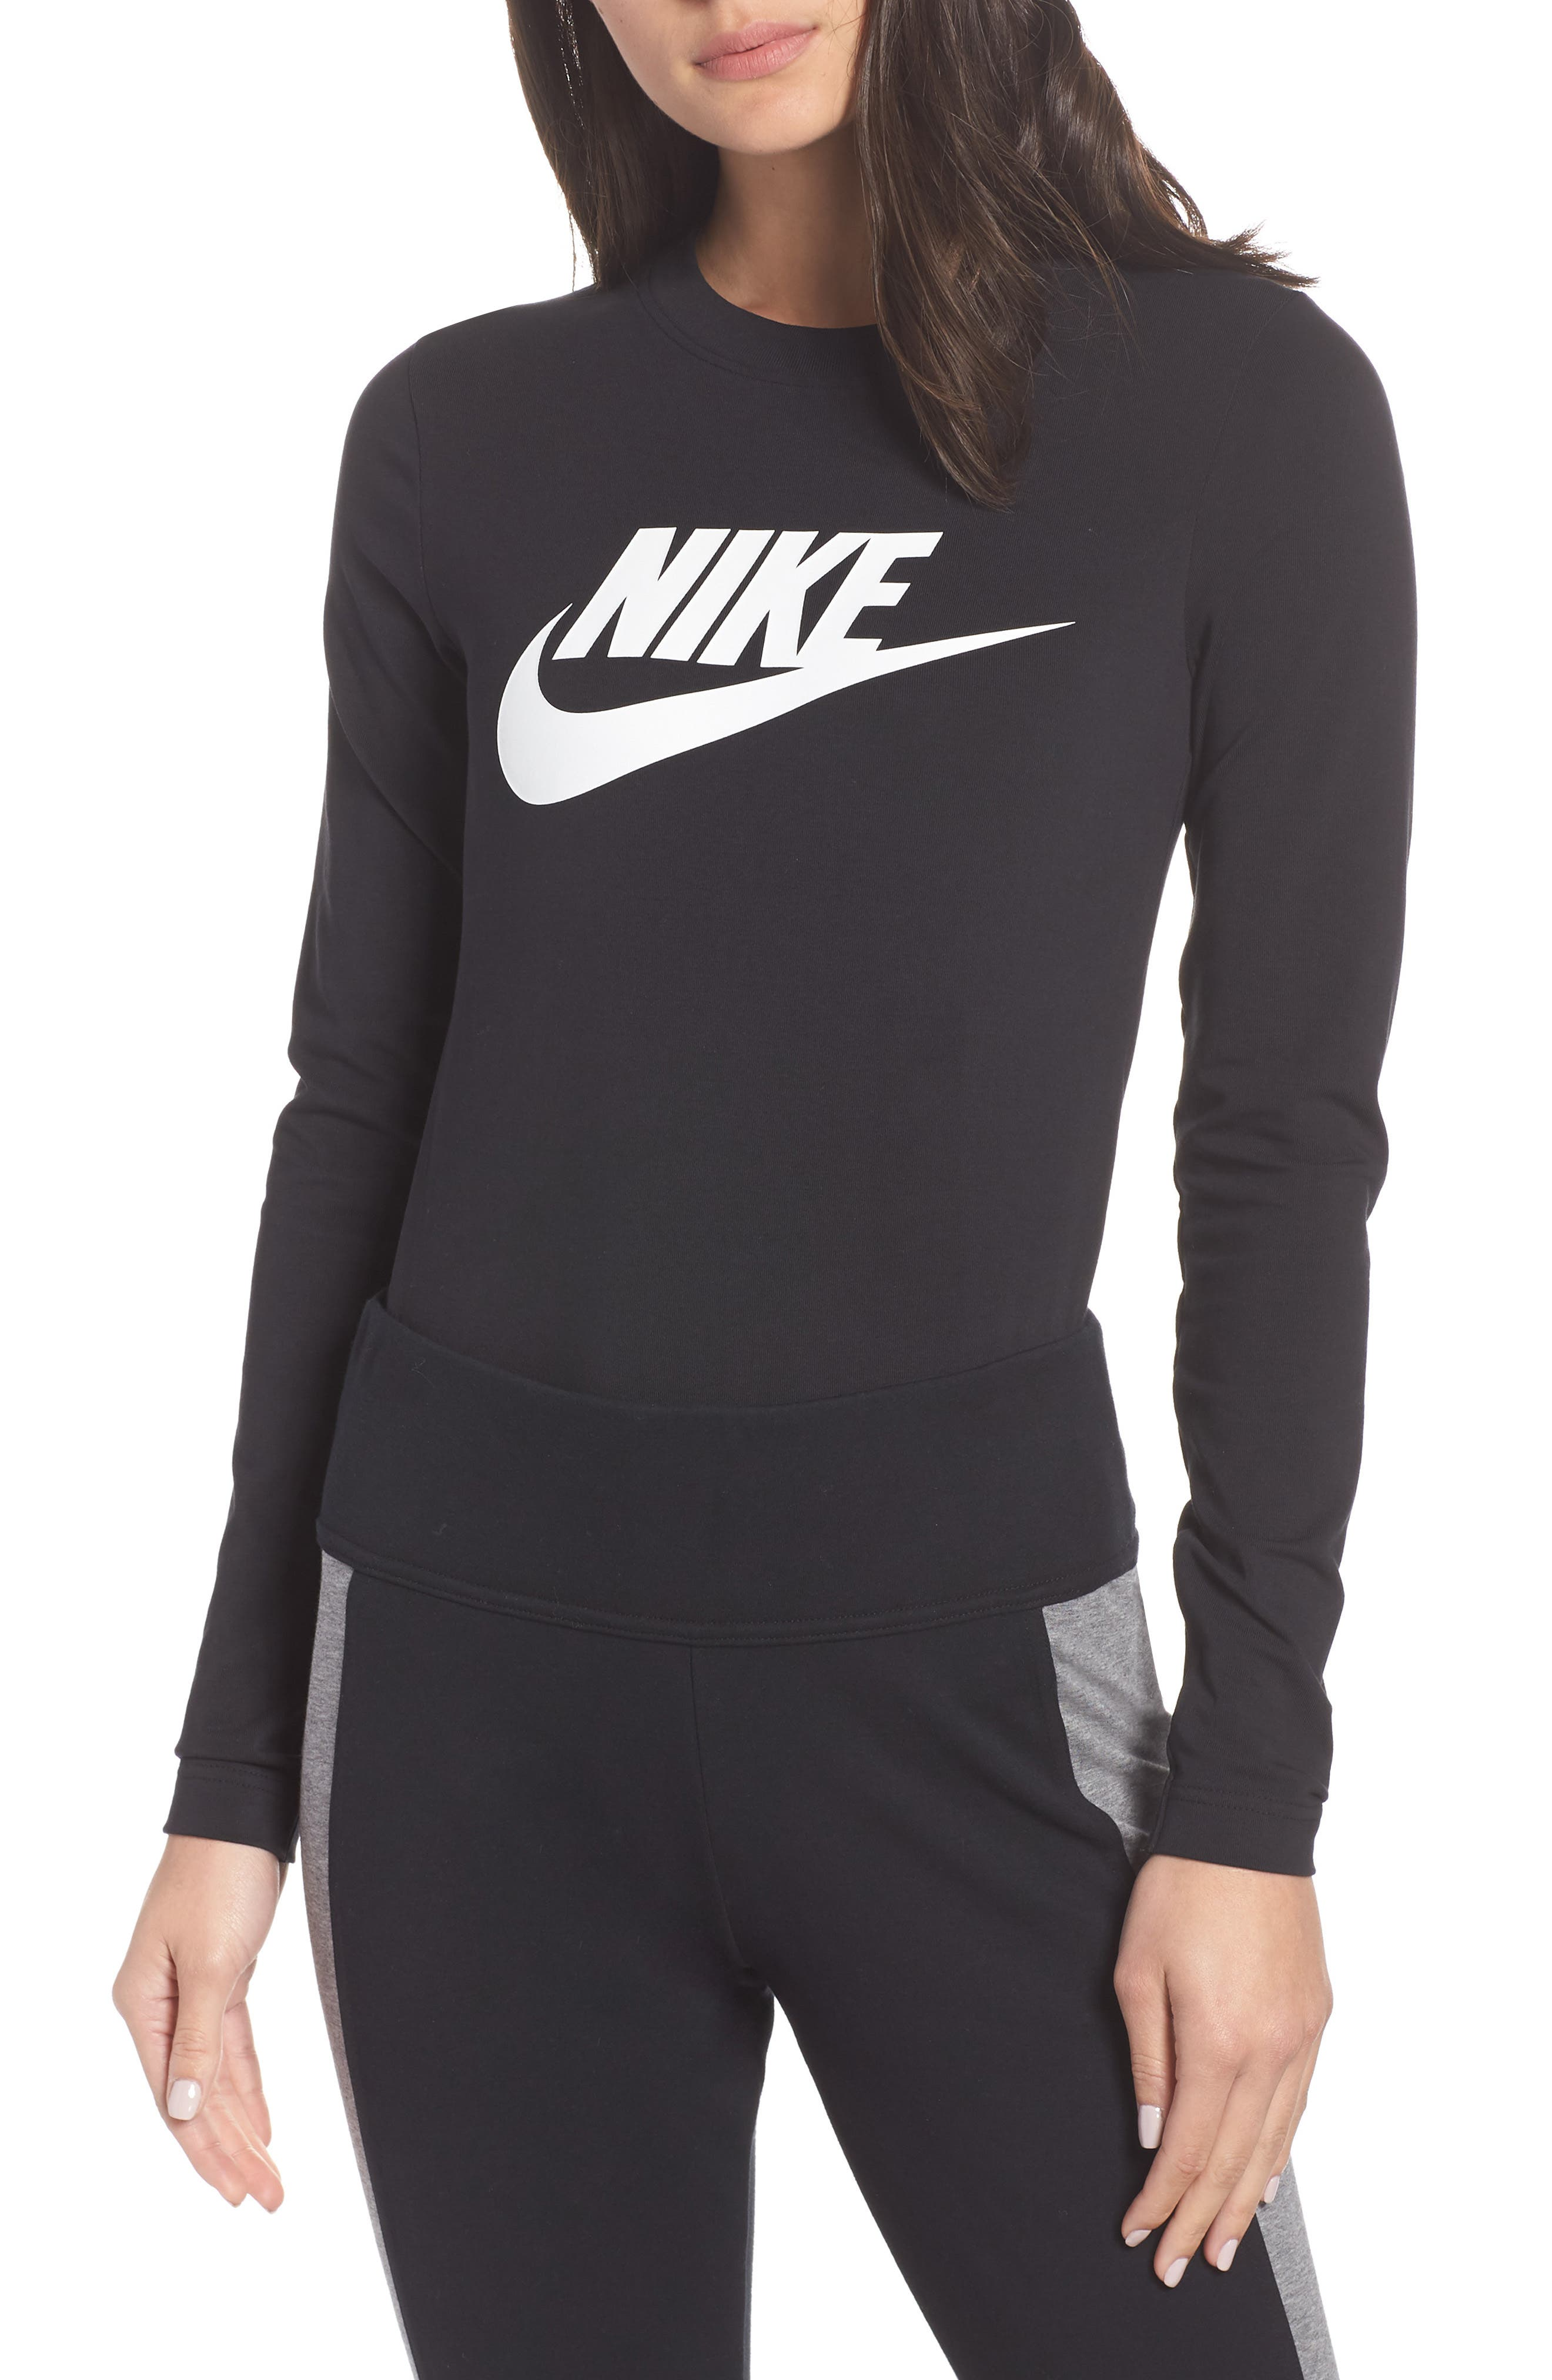 NSW Essential Bodysuit,                             Main thumbnail 1, color,                             BLACK/ BLACK/ WHITE